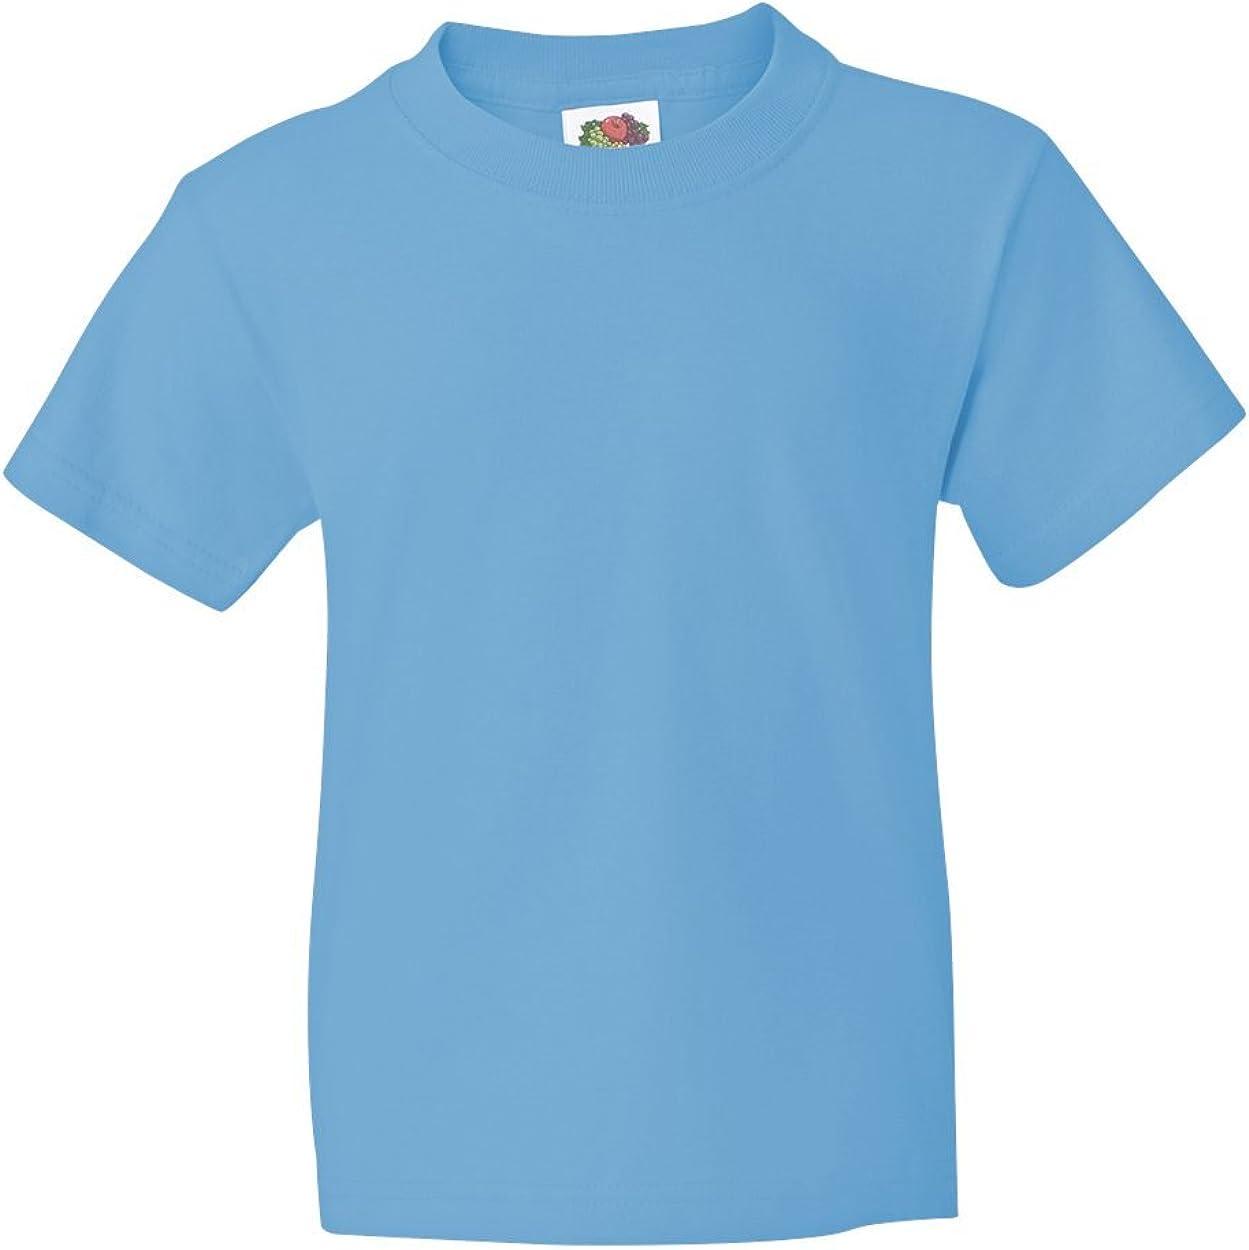 Fruit of the Loom Youth 5 oz., 100% Heavy Cotton HD T-Shirt (3931B) AQUATIC BLUE